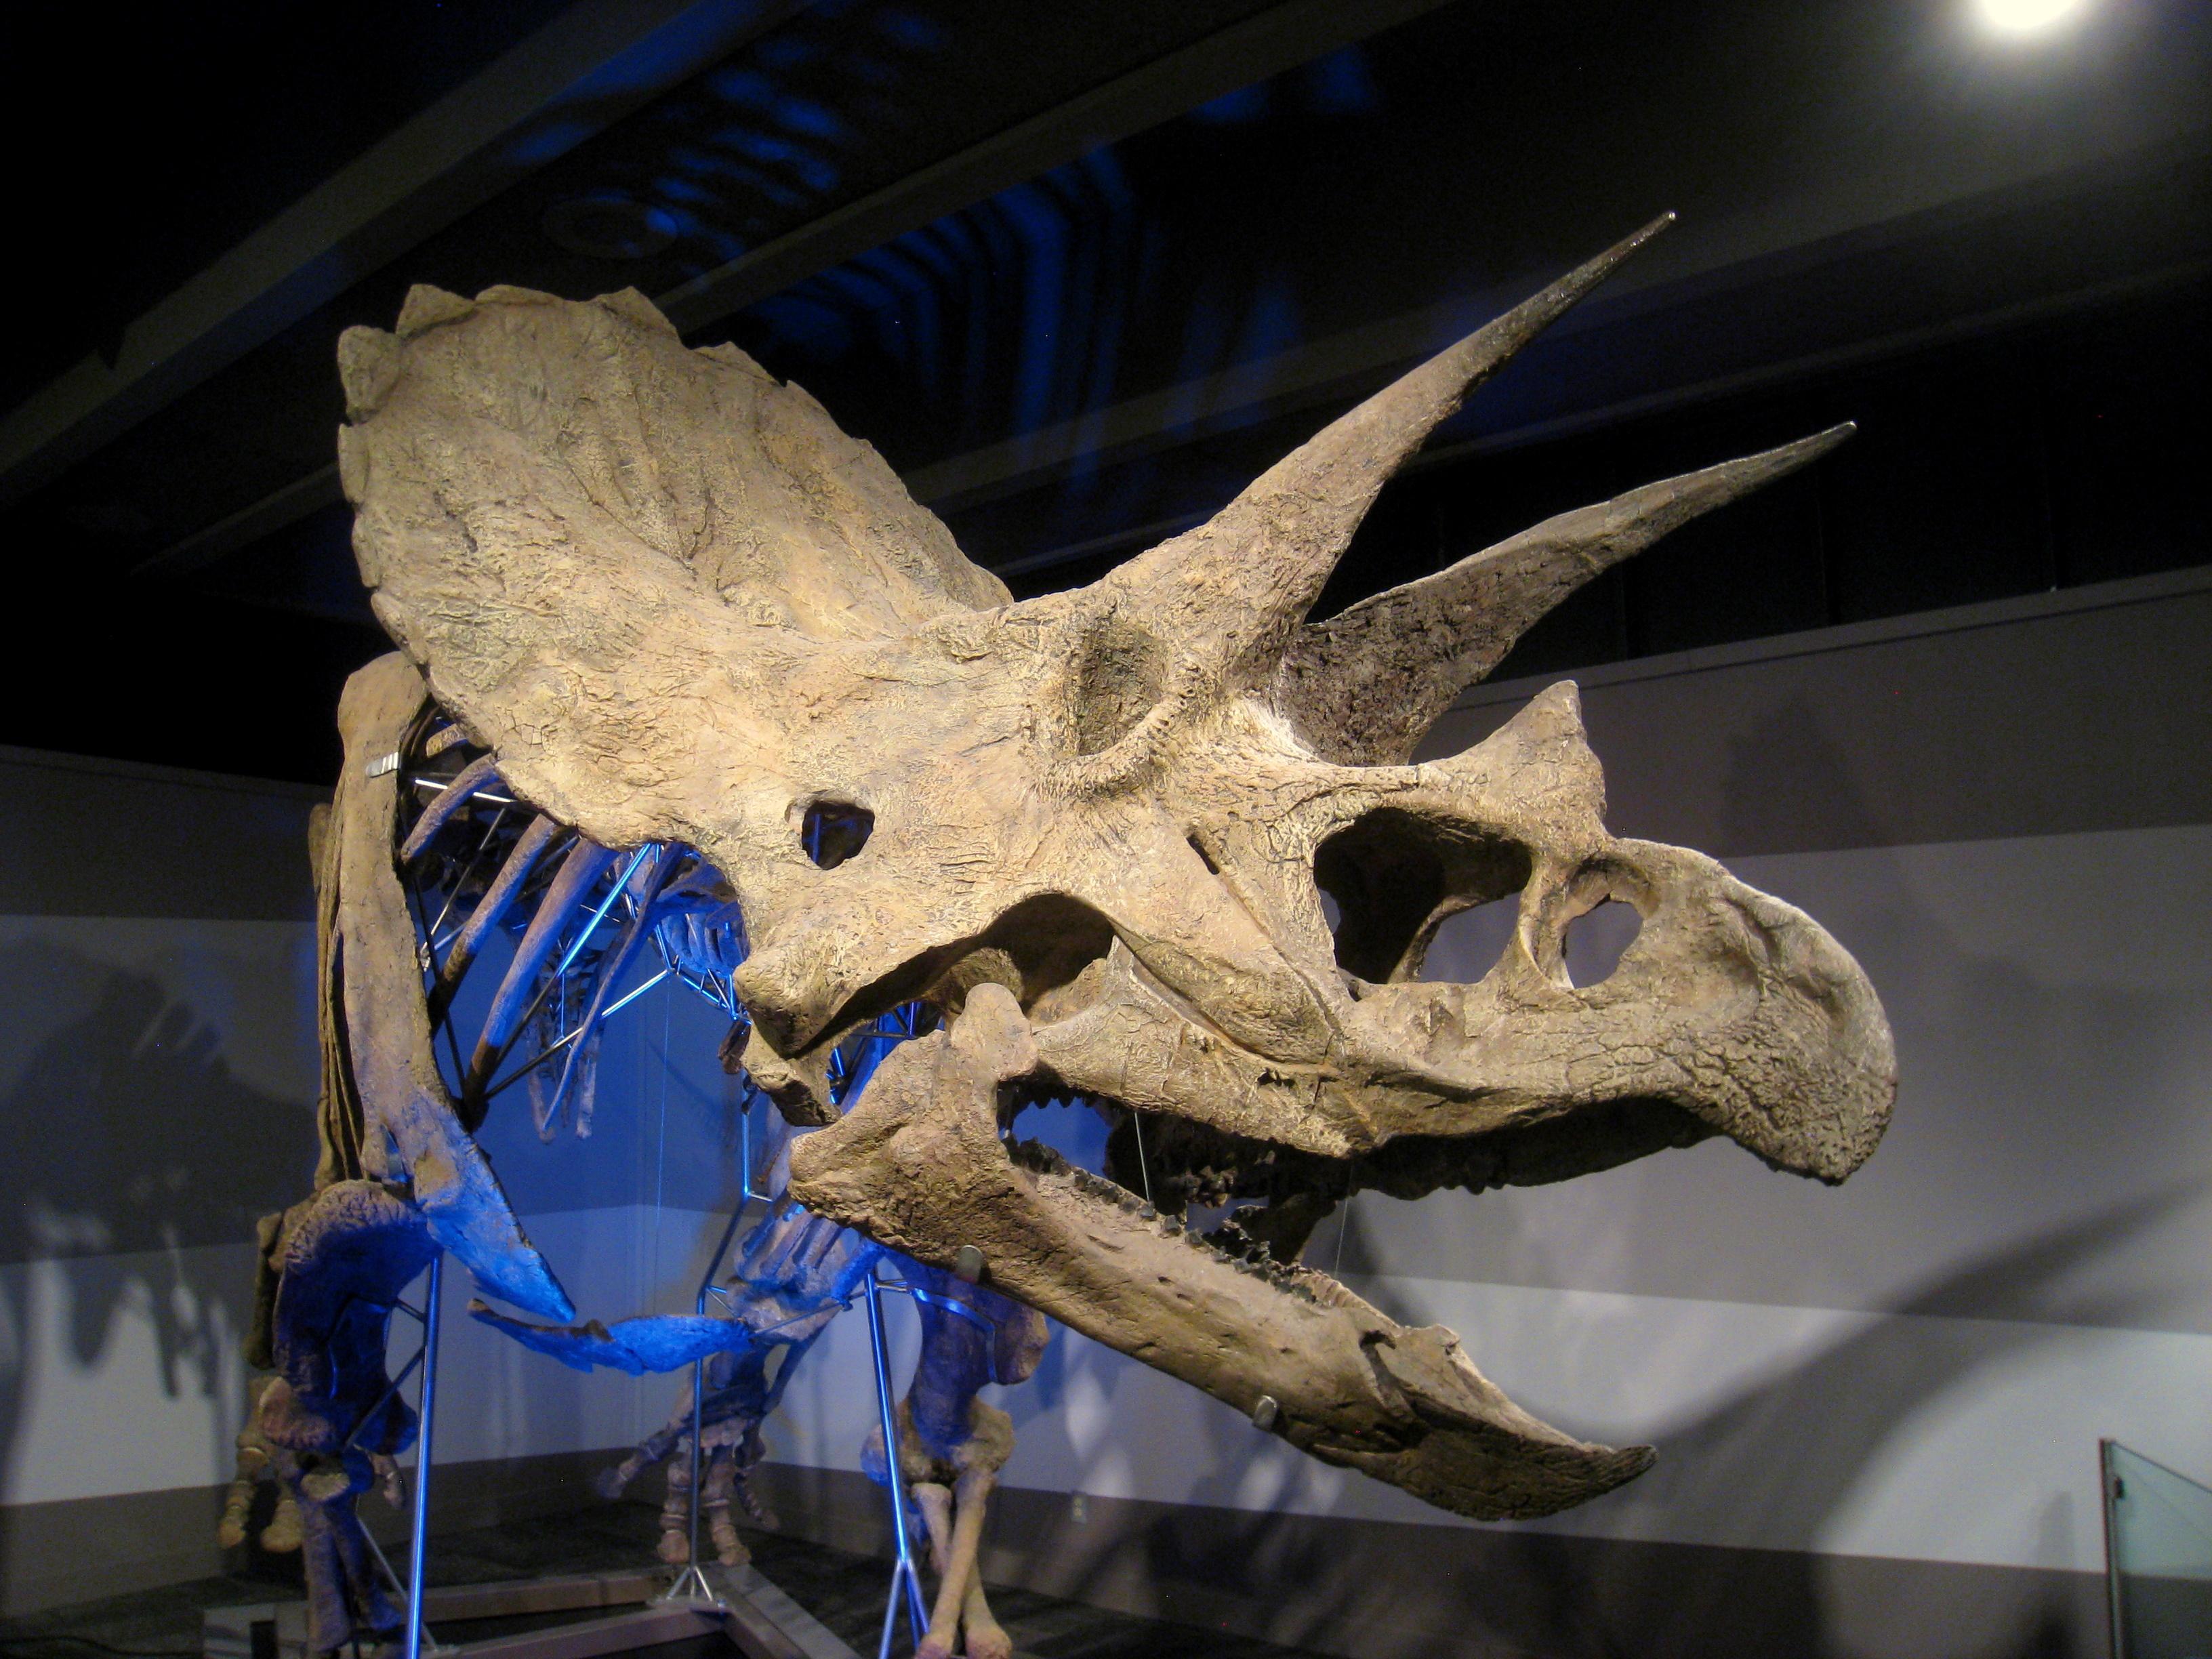 File:Museum of Science, Boston, MA - IMG 3206.JPG